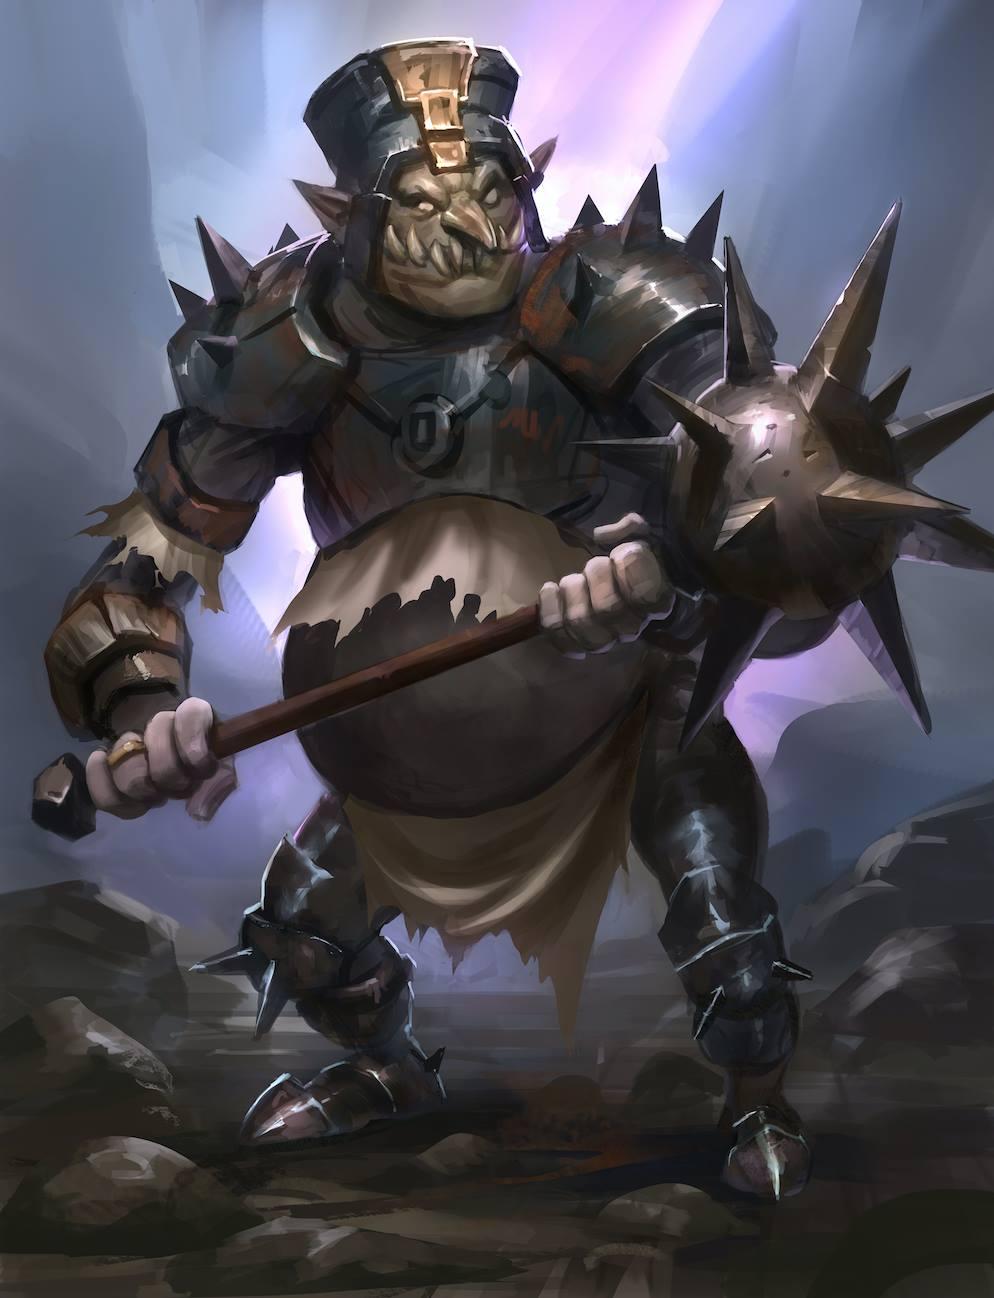 Iron Skin Behemoth